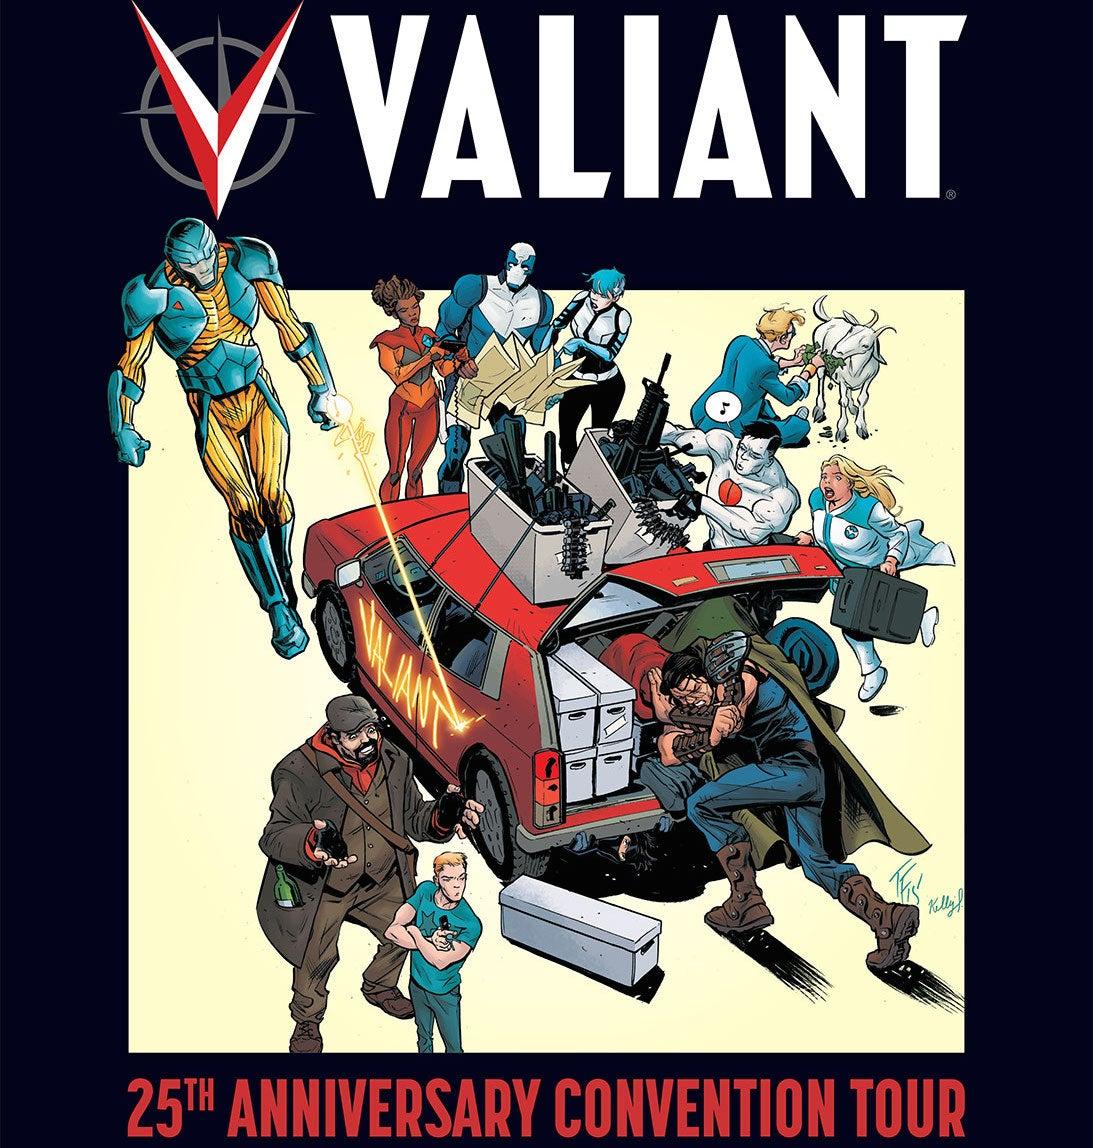 VALIANT 25th-Anniversary-Con-Tour Art-by-Tom-Fowler